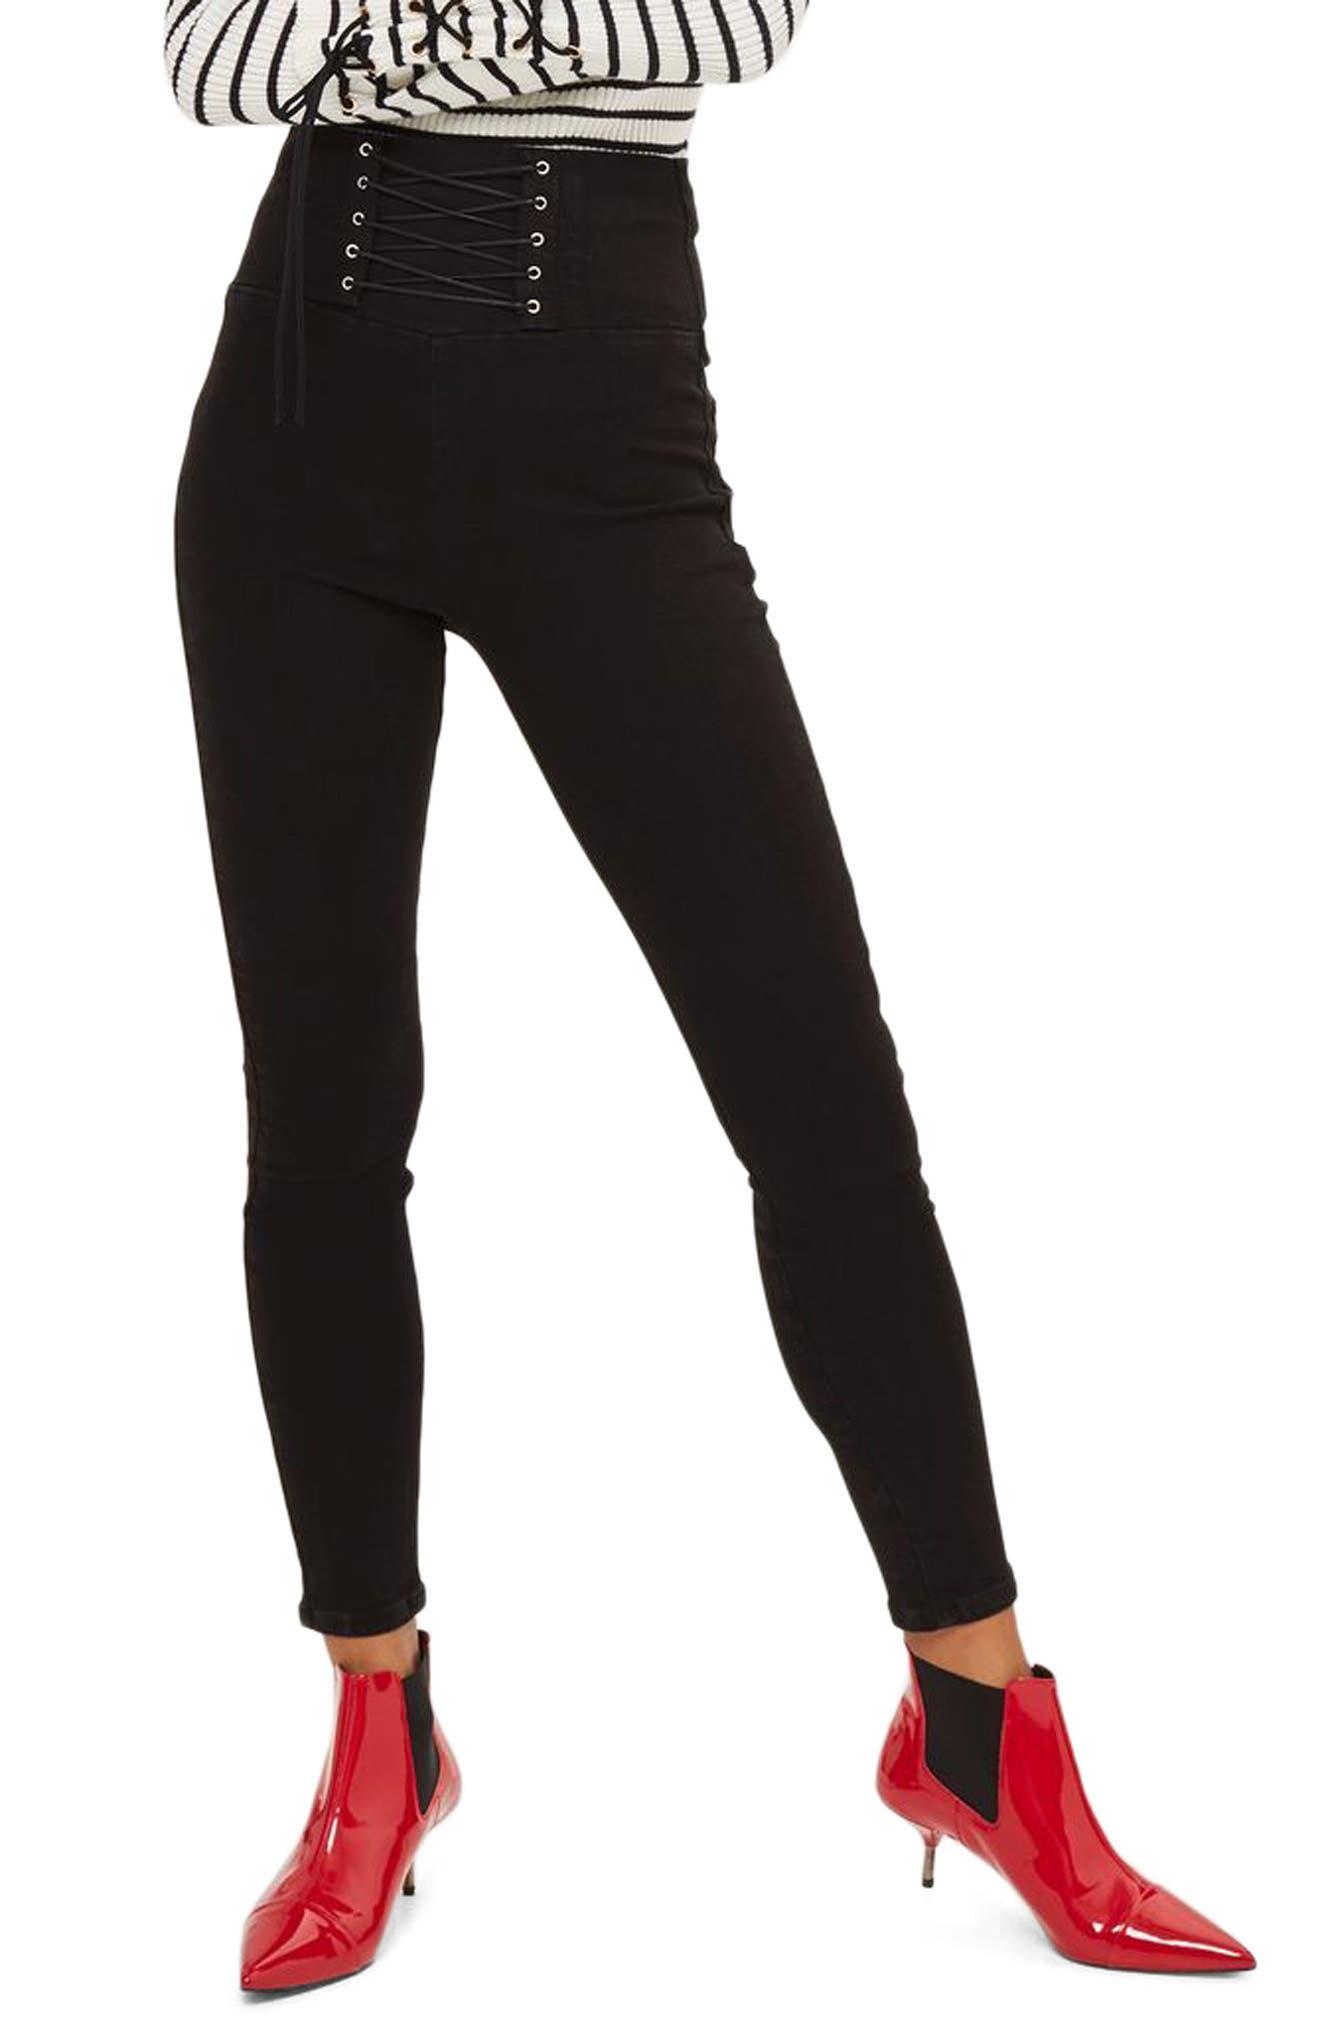 Alternate Image 1 Selected - Topshop Jamie Corset High Waist Skinny Jeans